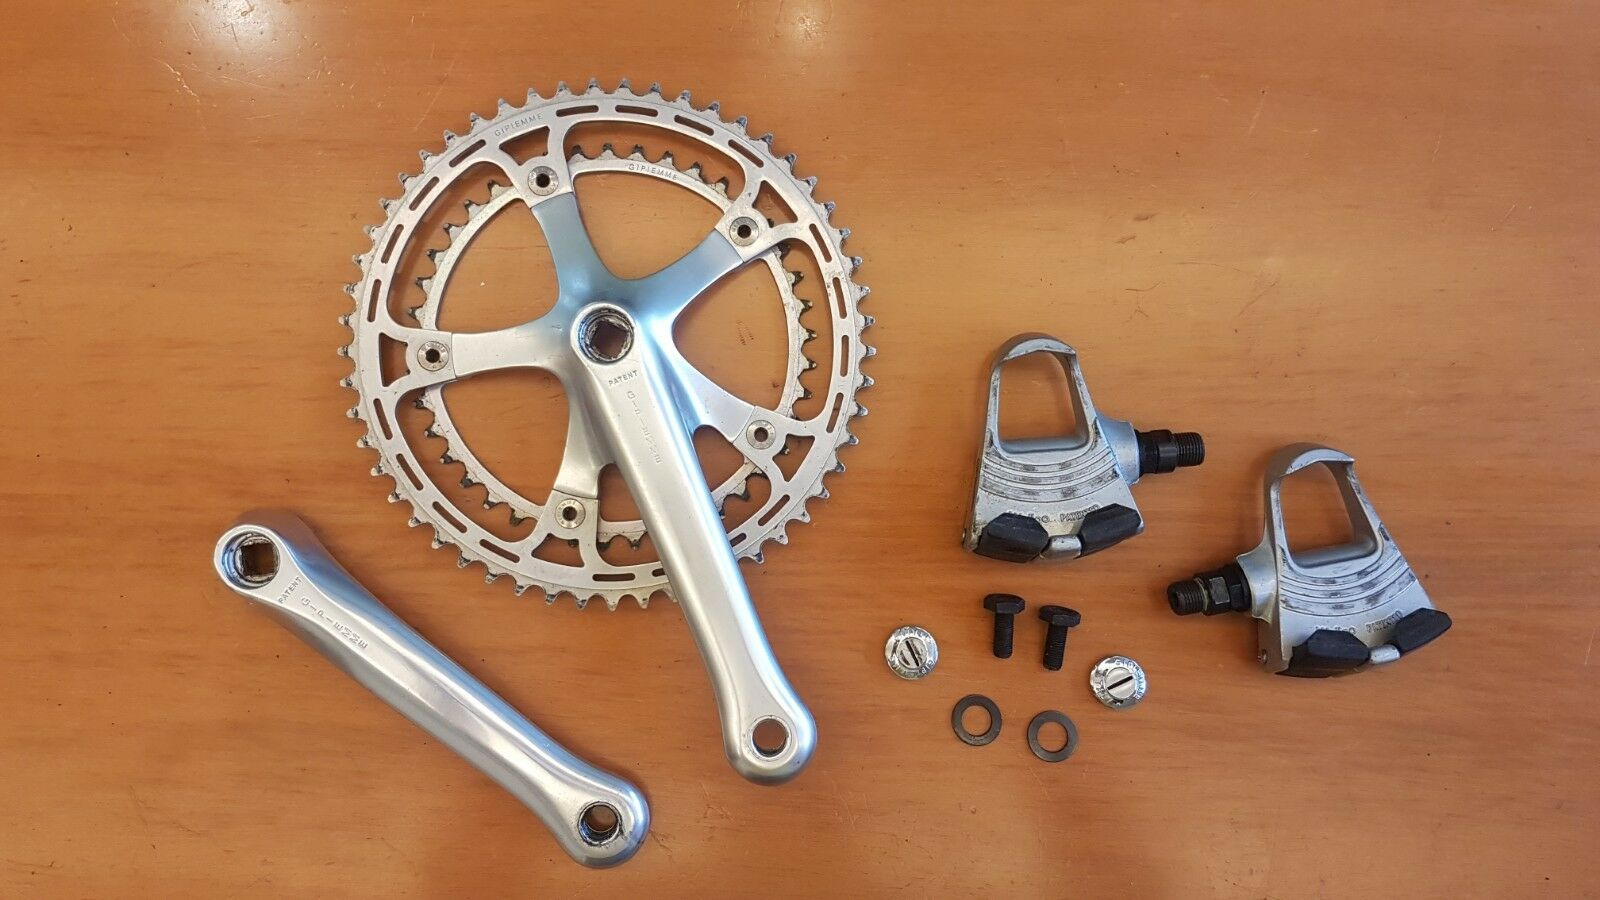 NOS GIPIEMME STRADA 170 crankset and pedals vintage italian road bike